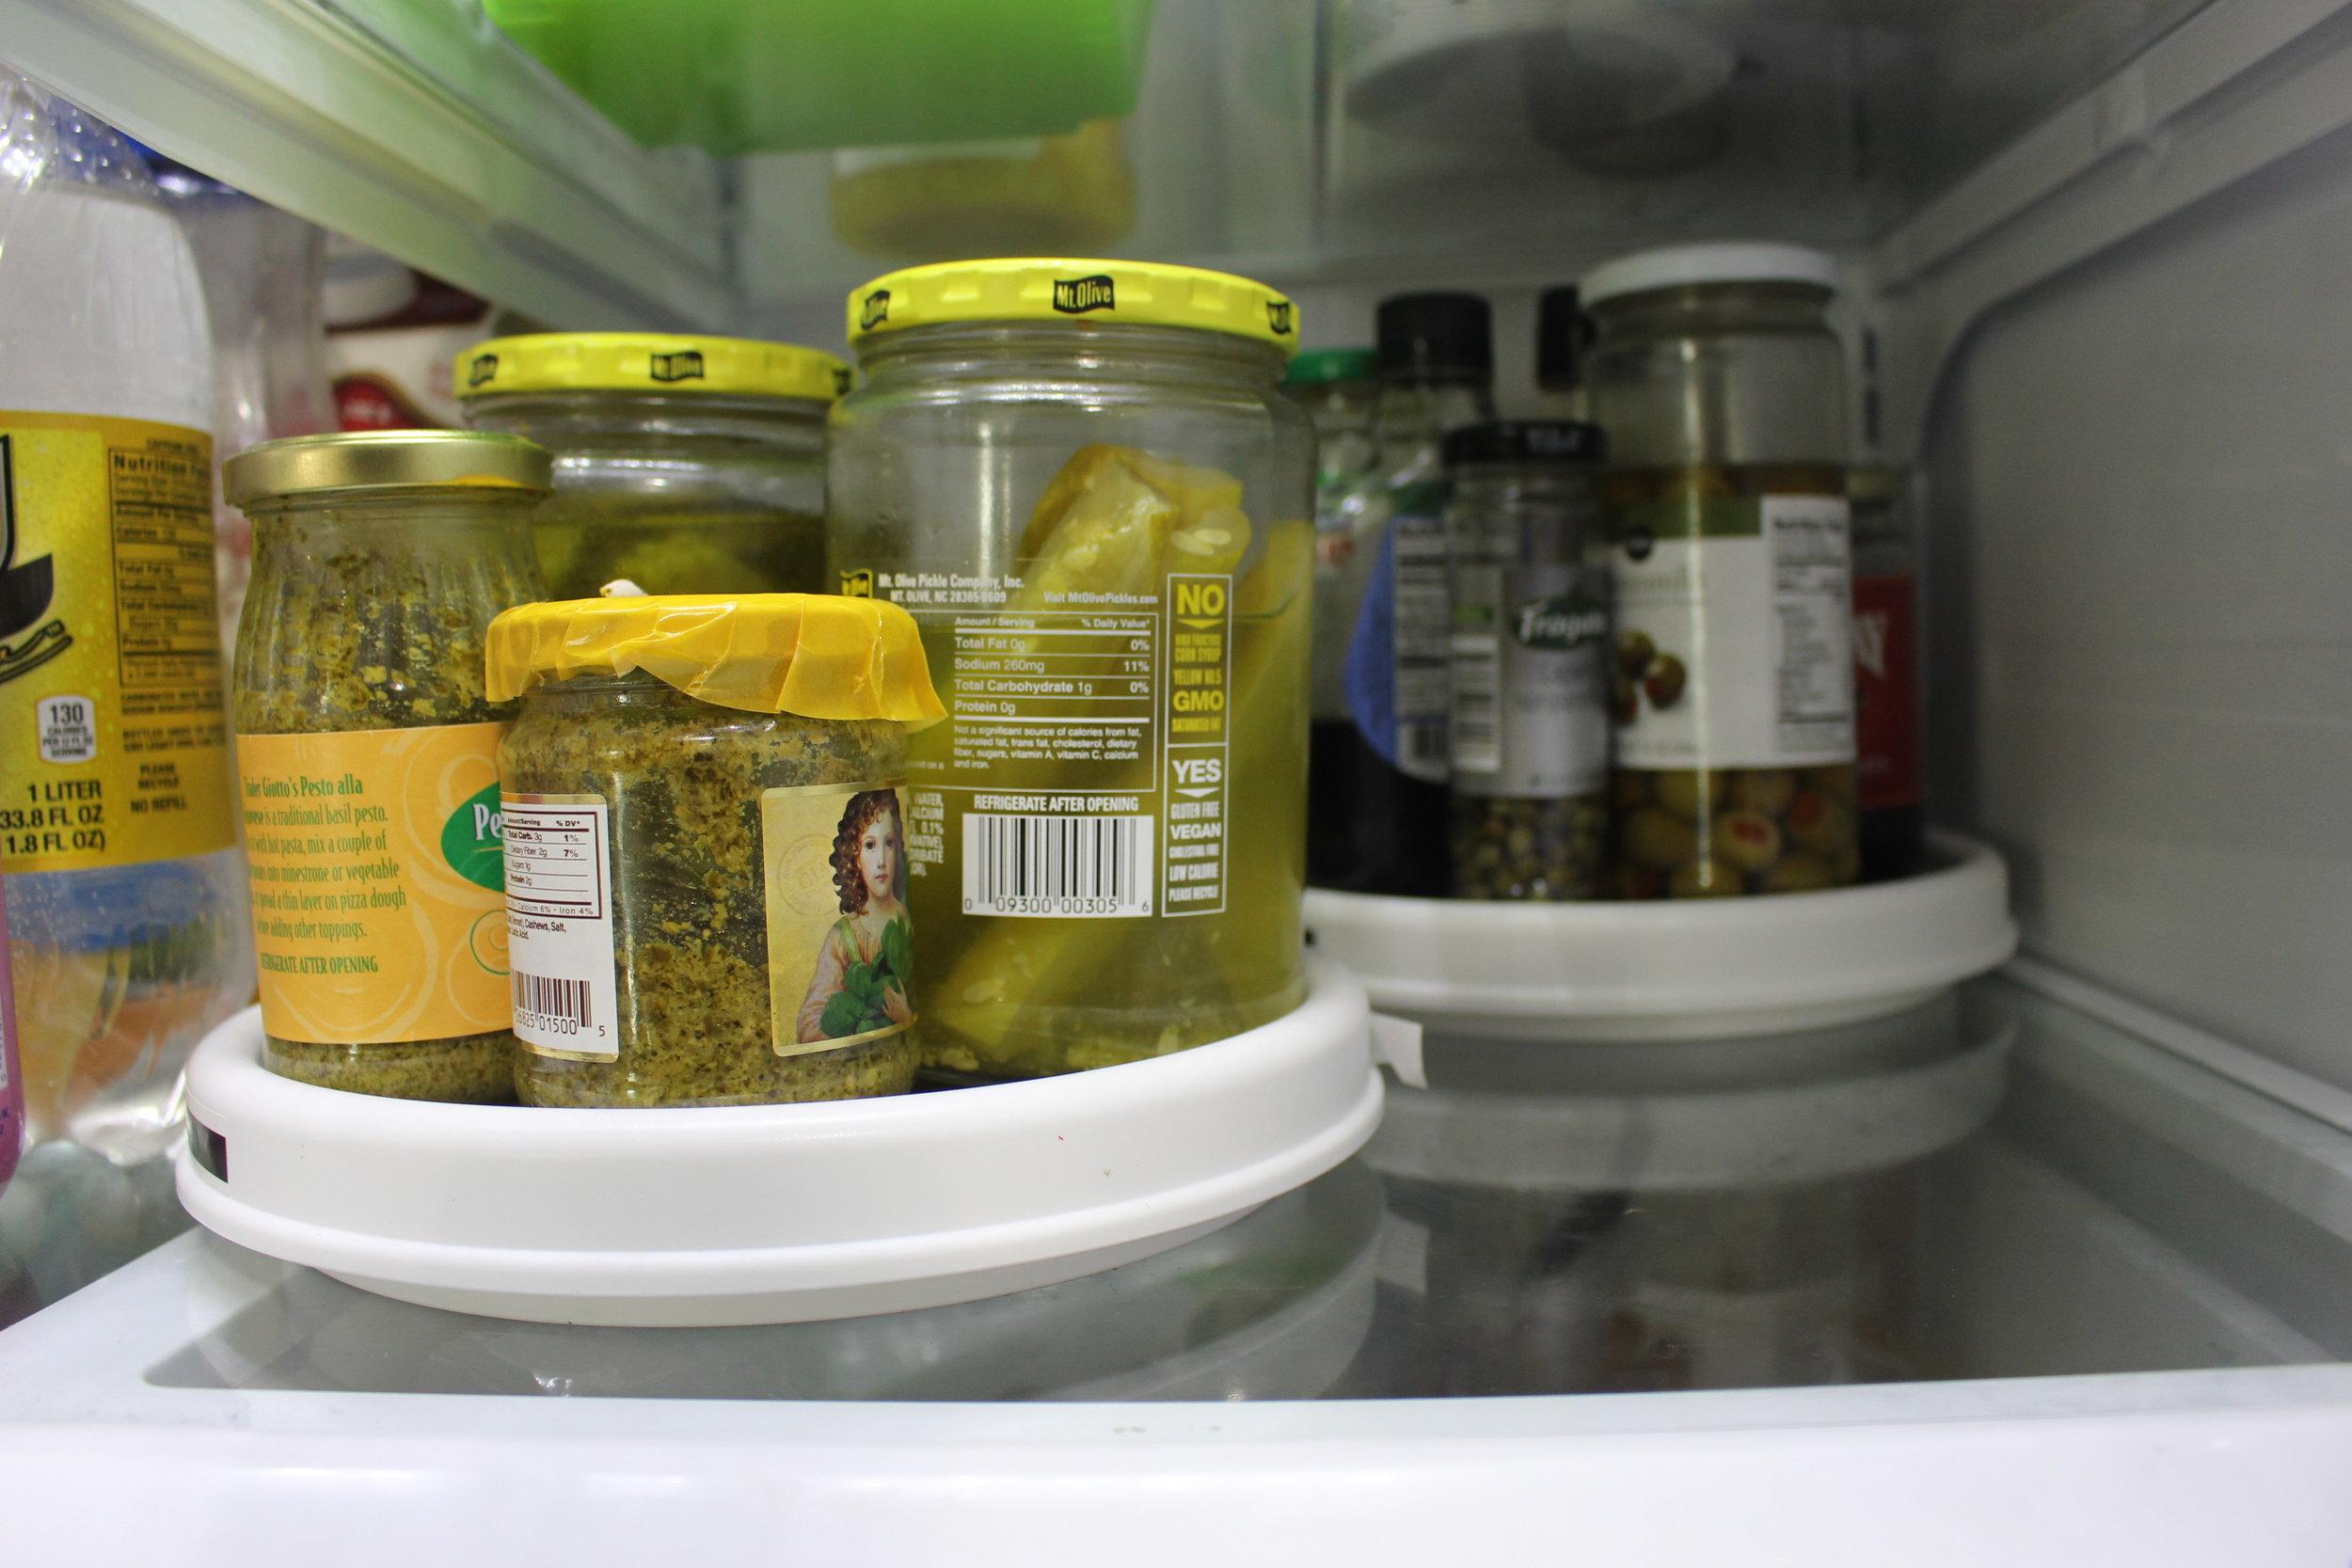 Using lazy susan's to help organize your fridge